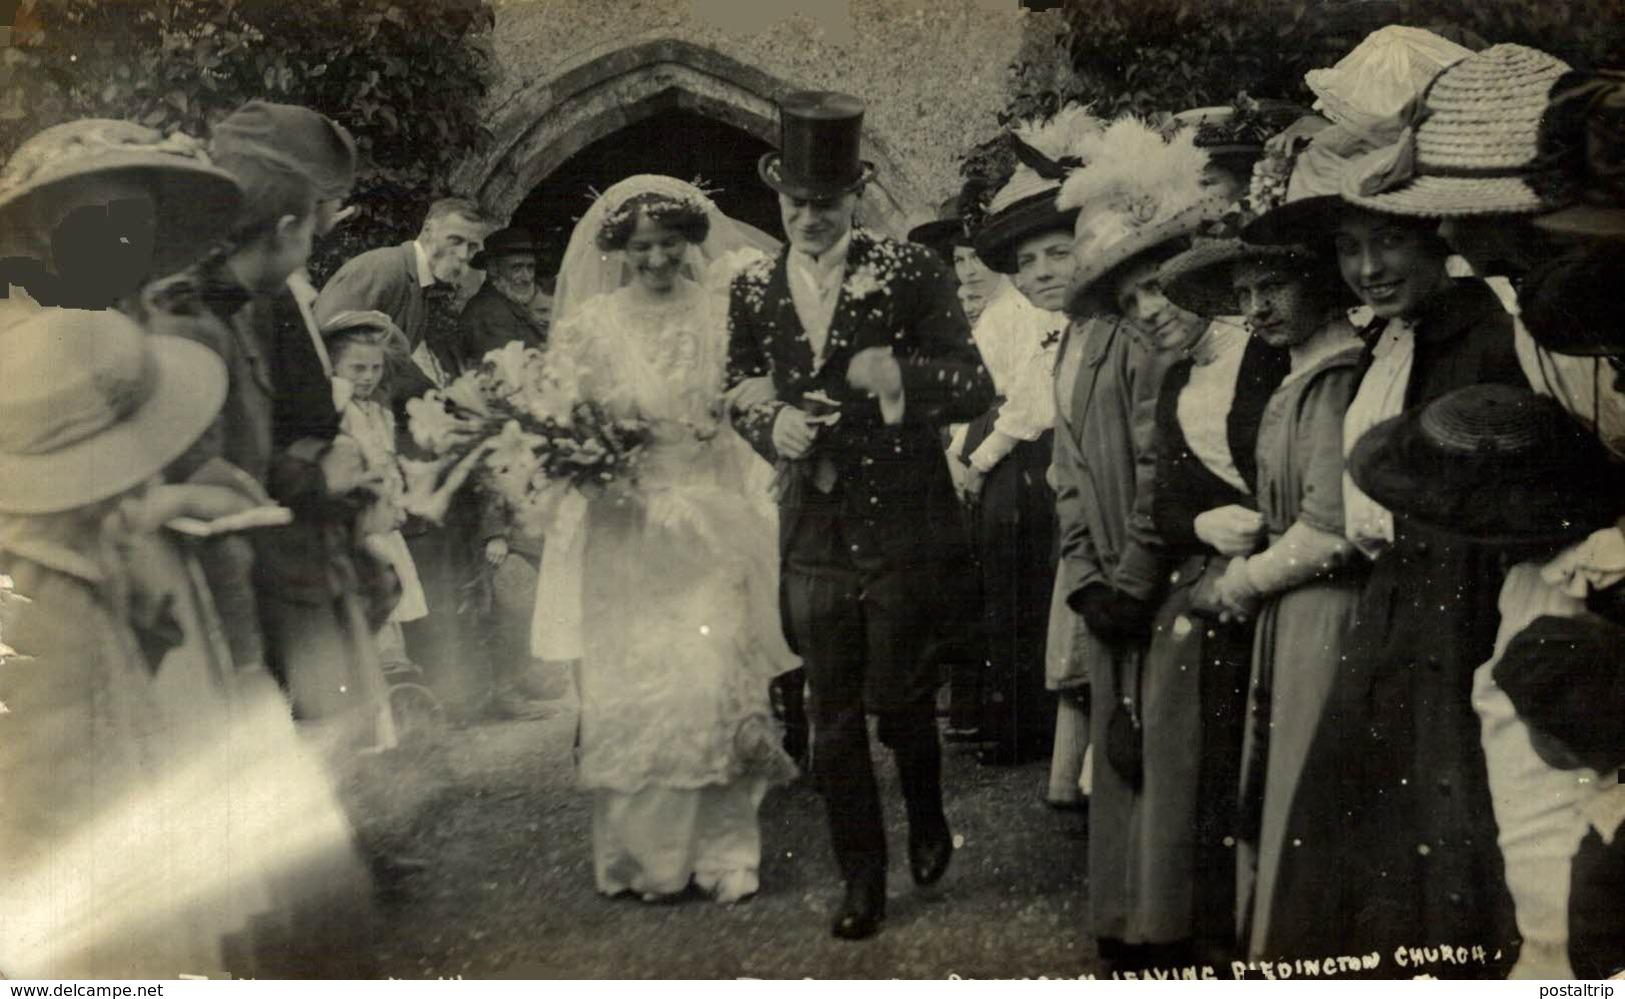 RPPC LEAVING BLEDINGTON CHURCH   FRANK PACKER PHOTOGRAPHER CHIPPING NORTON HISTORIA SOCIAL - Other